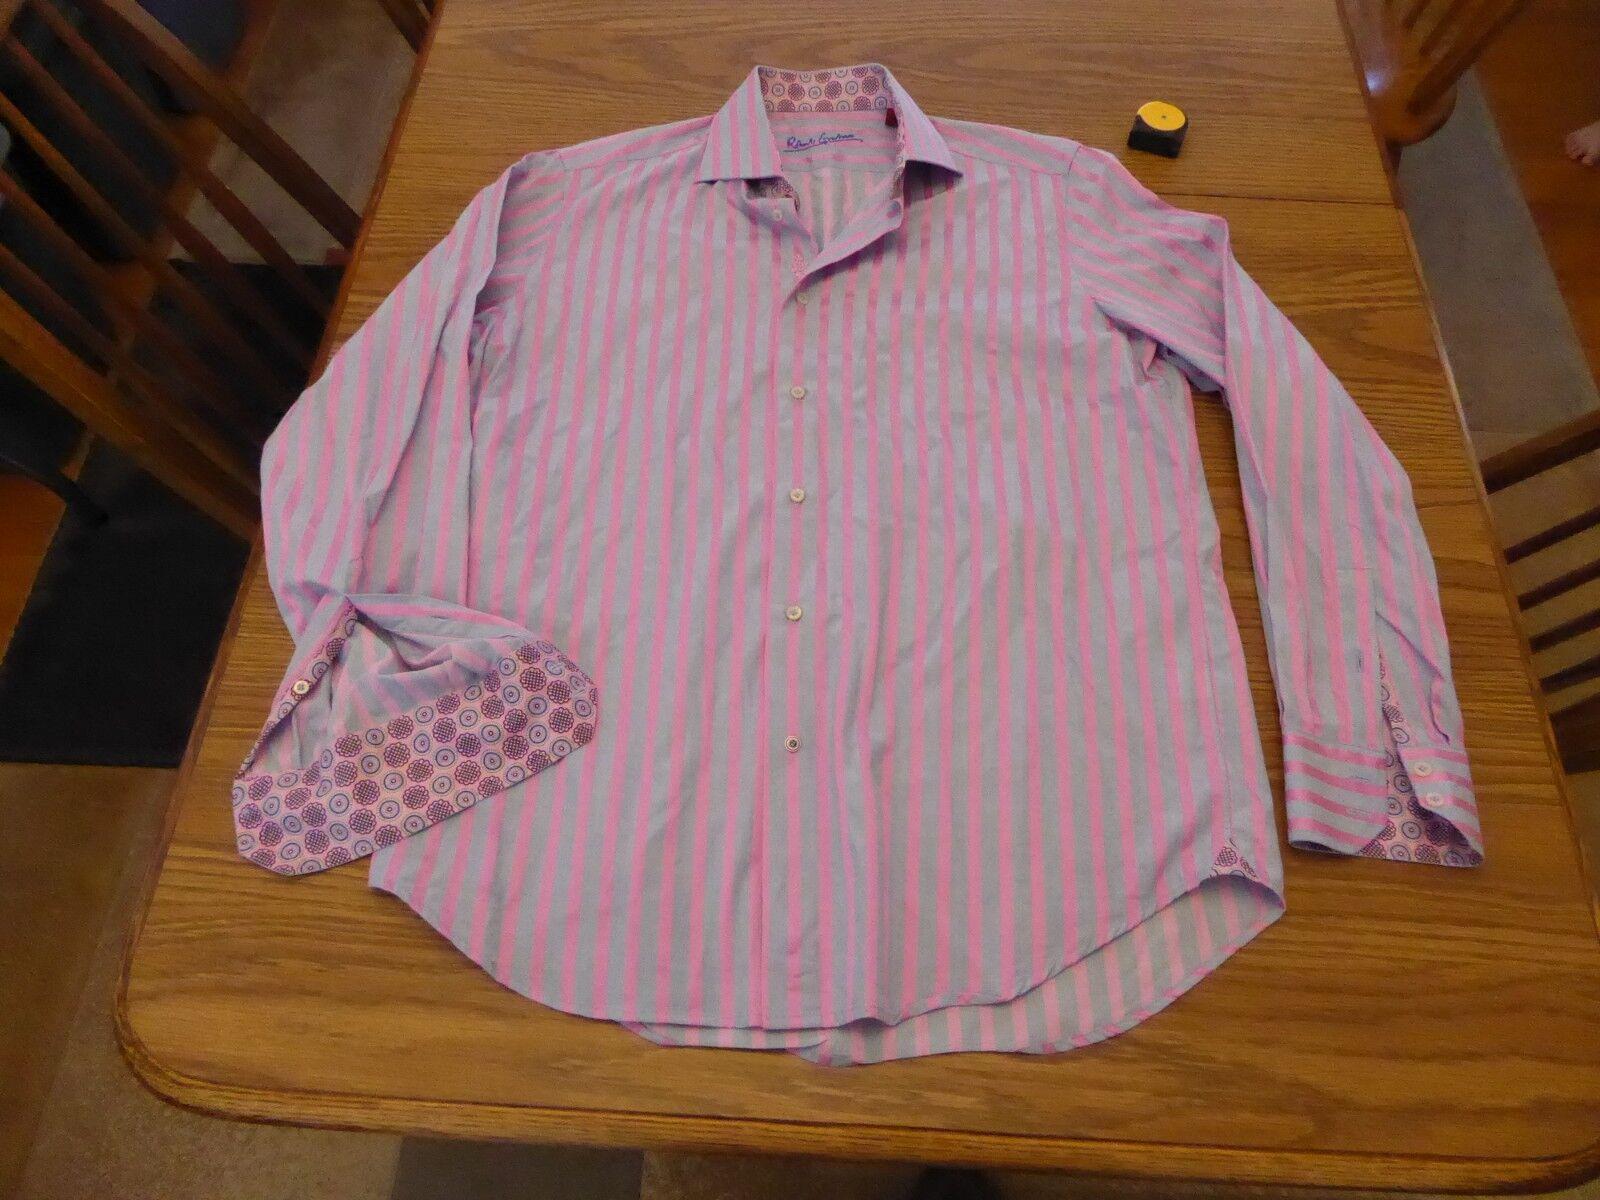 Robert Graham Shirt 40 16 M L Pink bluee Cuff Cotton Very Good Pre Owned Cond